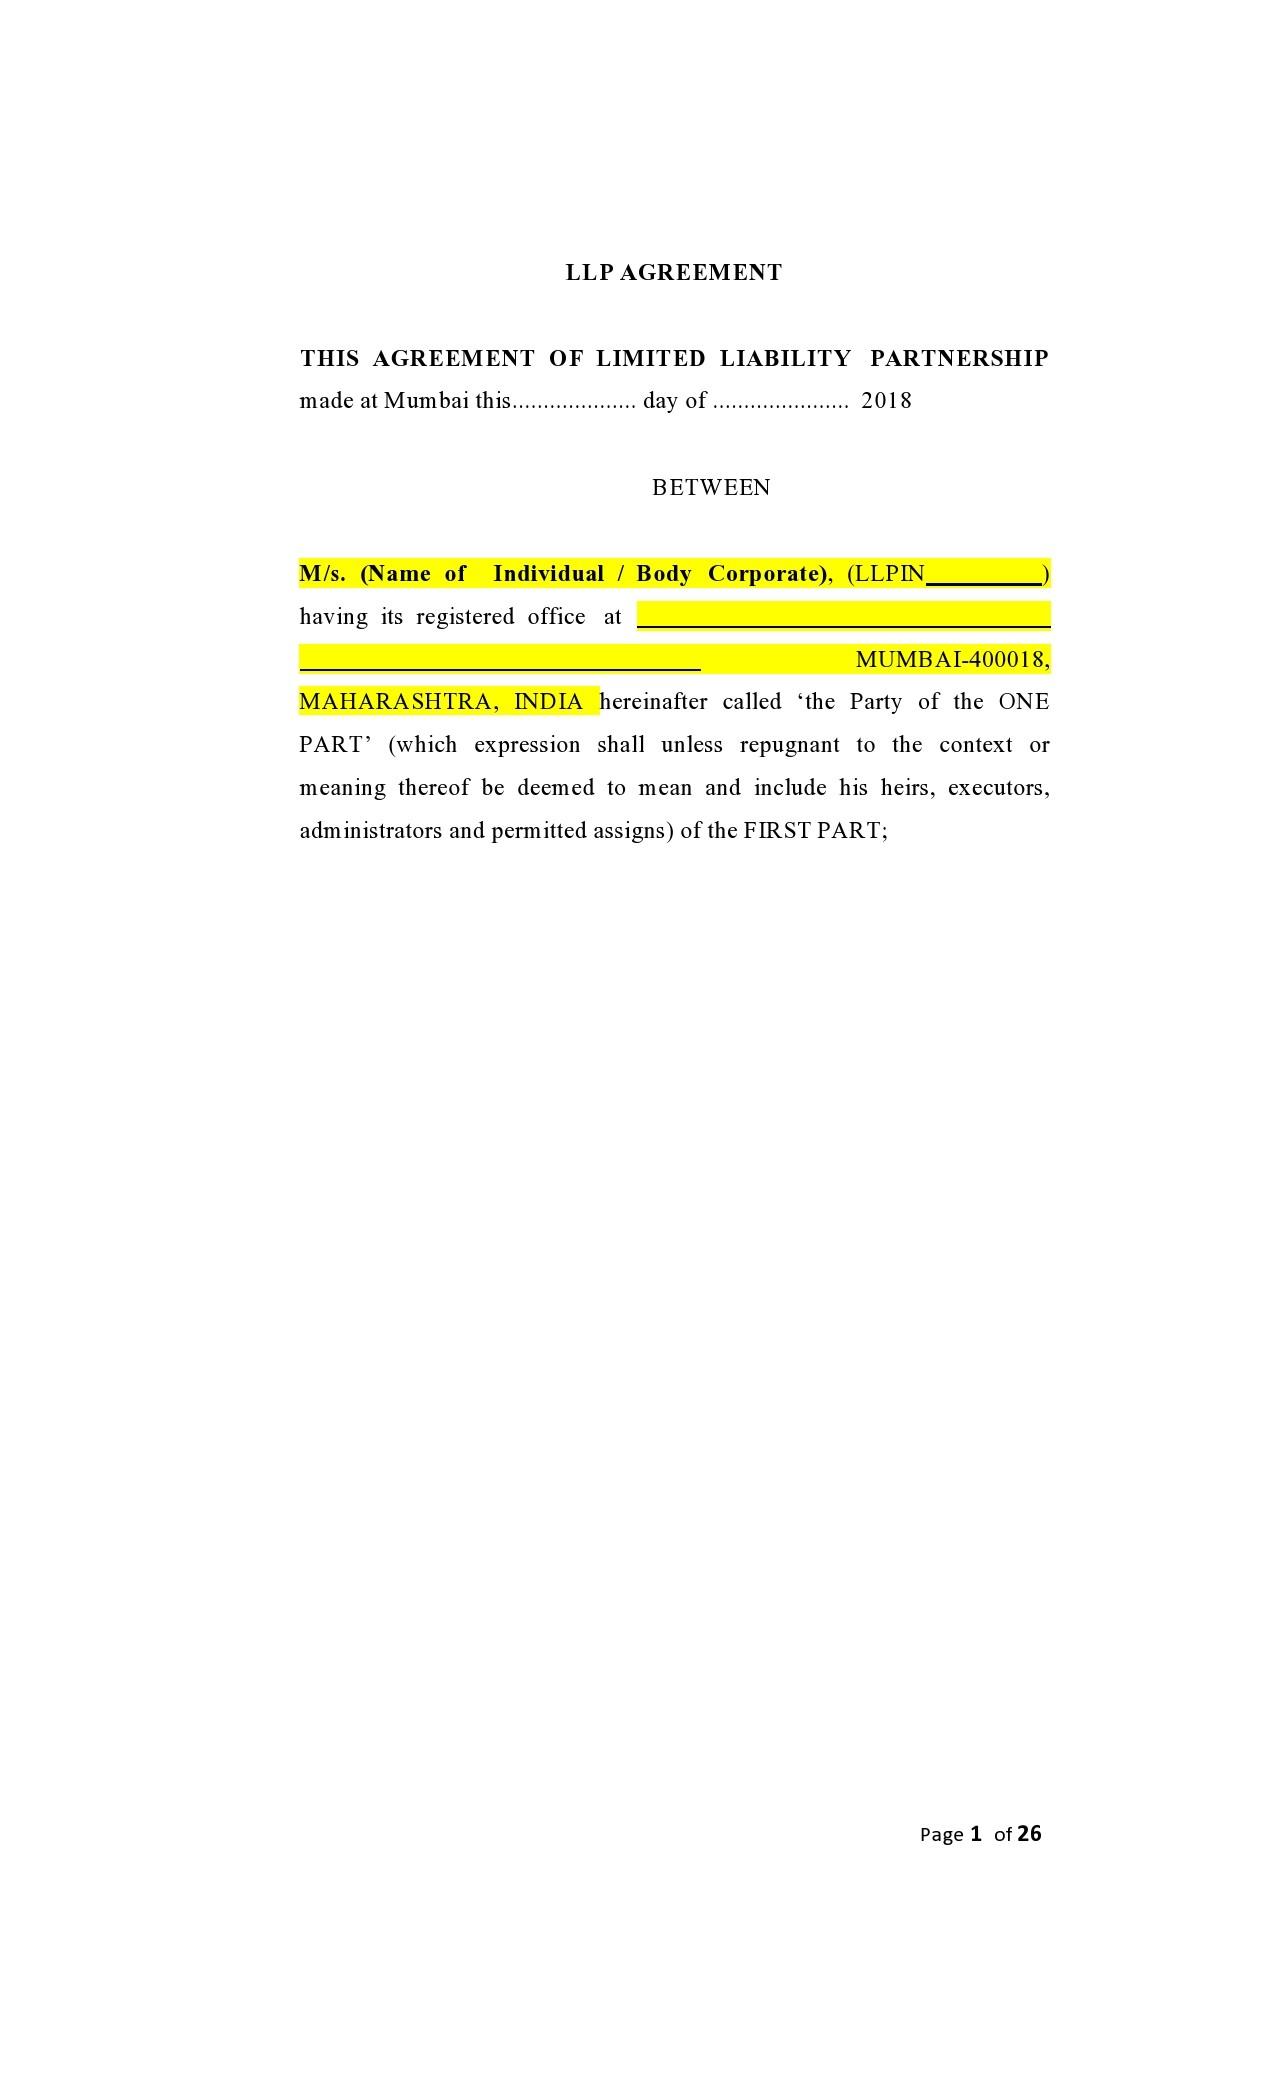 Free limited partnership agreement 19